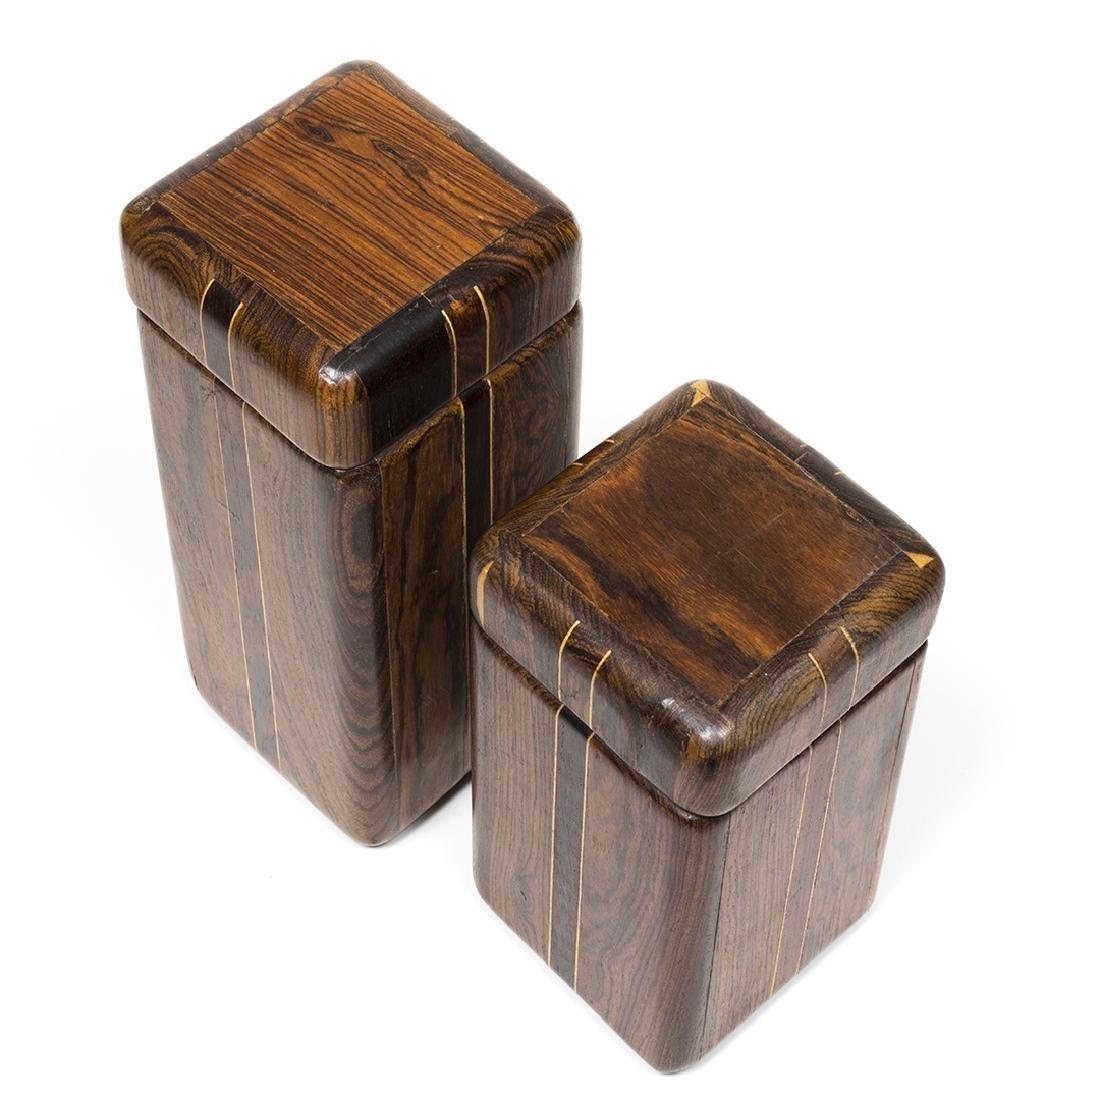 Don Shoemaker Lidded Boxes (2) - 3